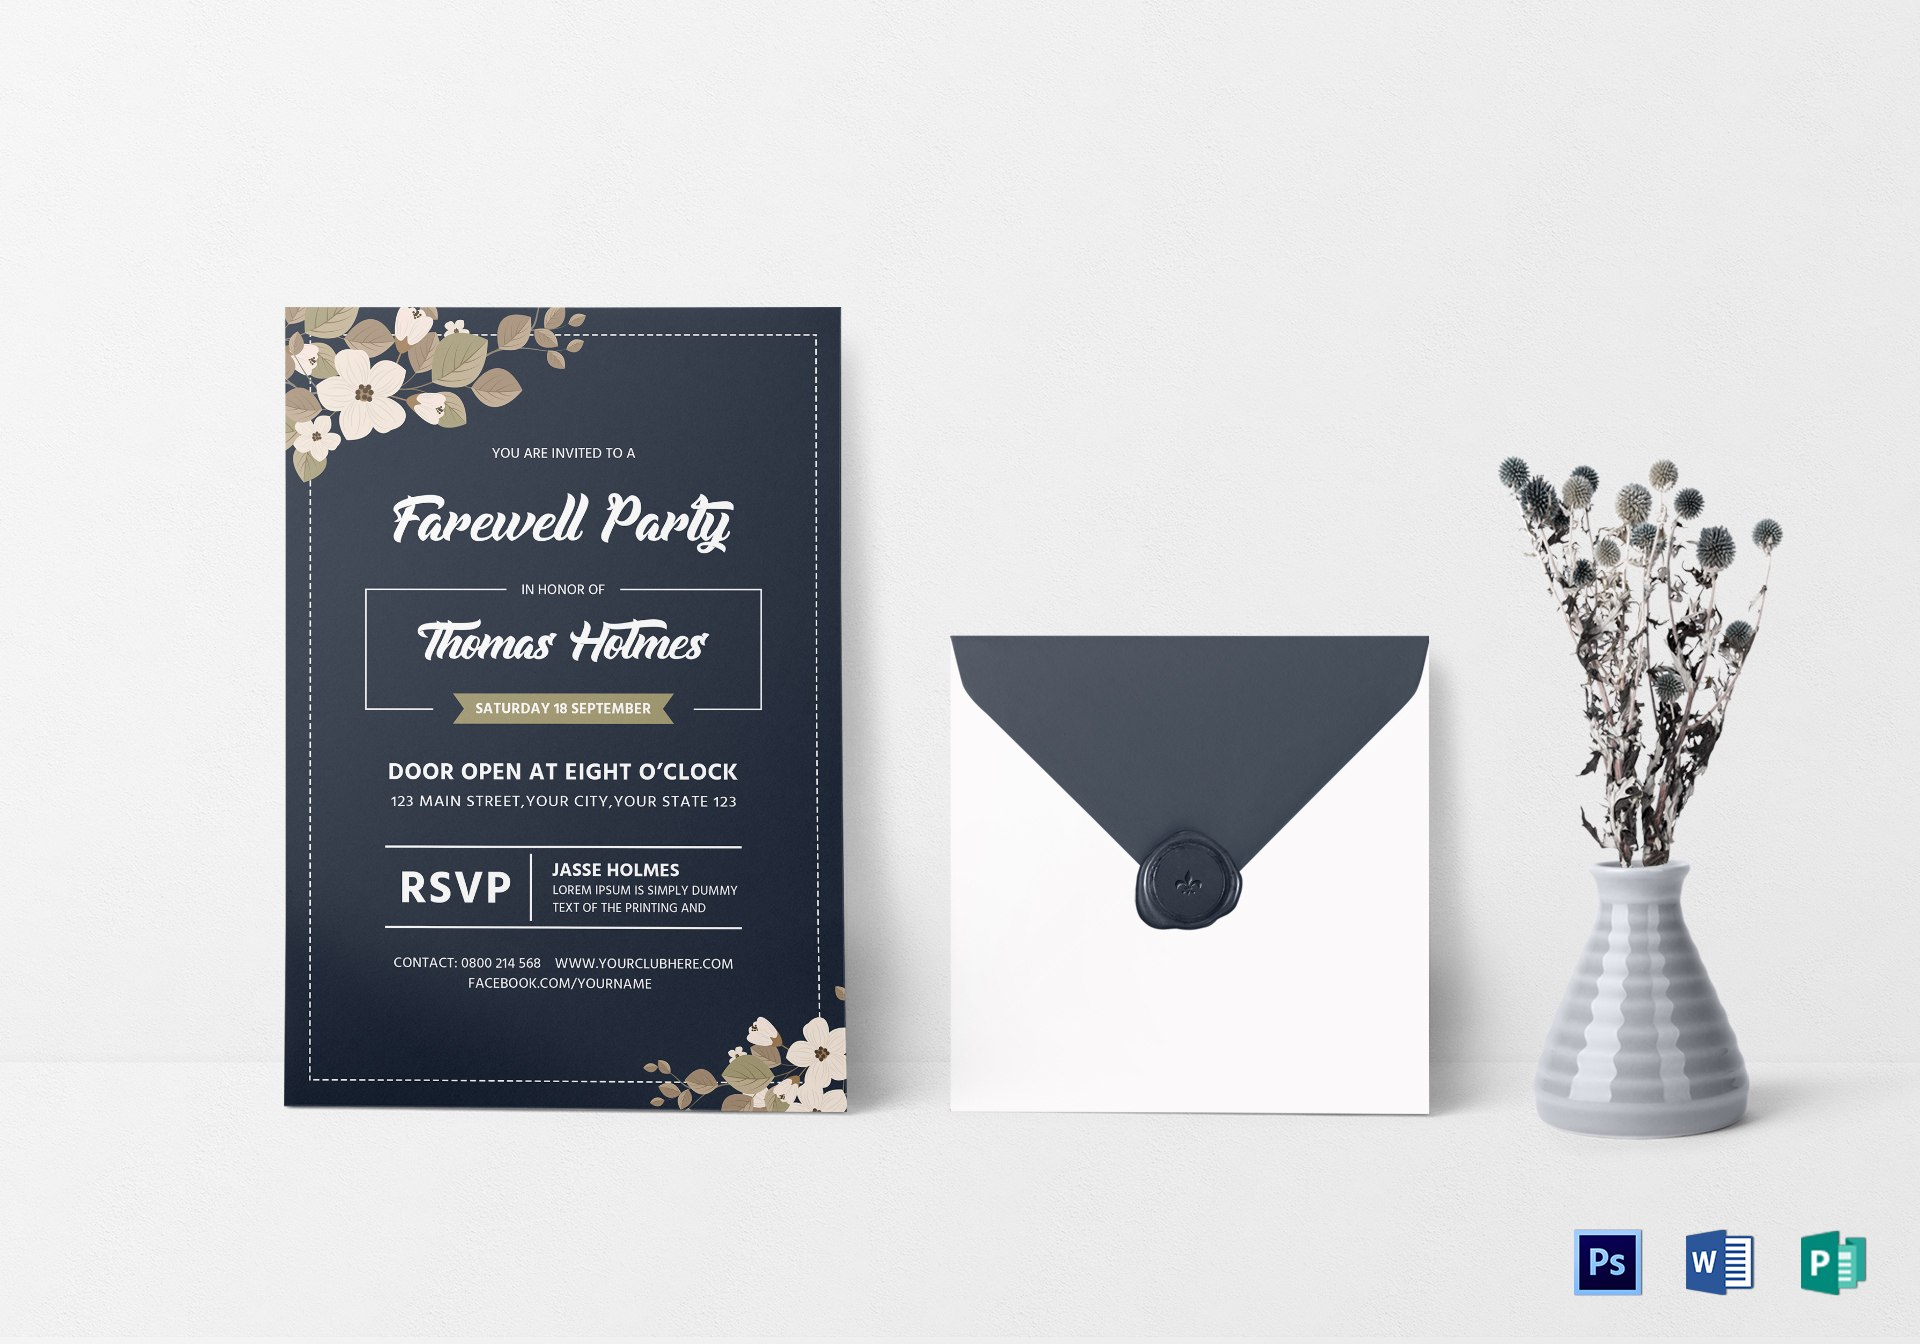 Farewell Party Invitation Card Design Template In Word Psd Publisher Regarding Farewell Invitation Card Template